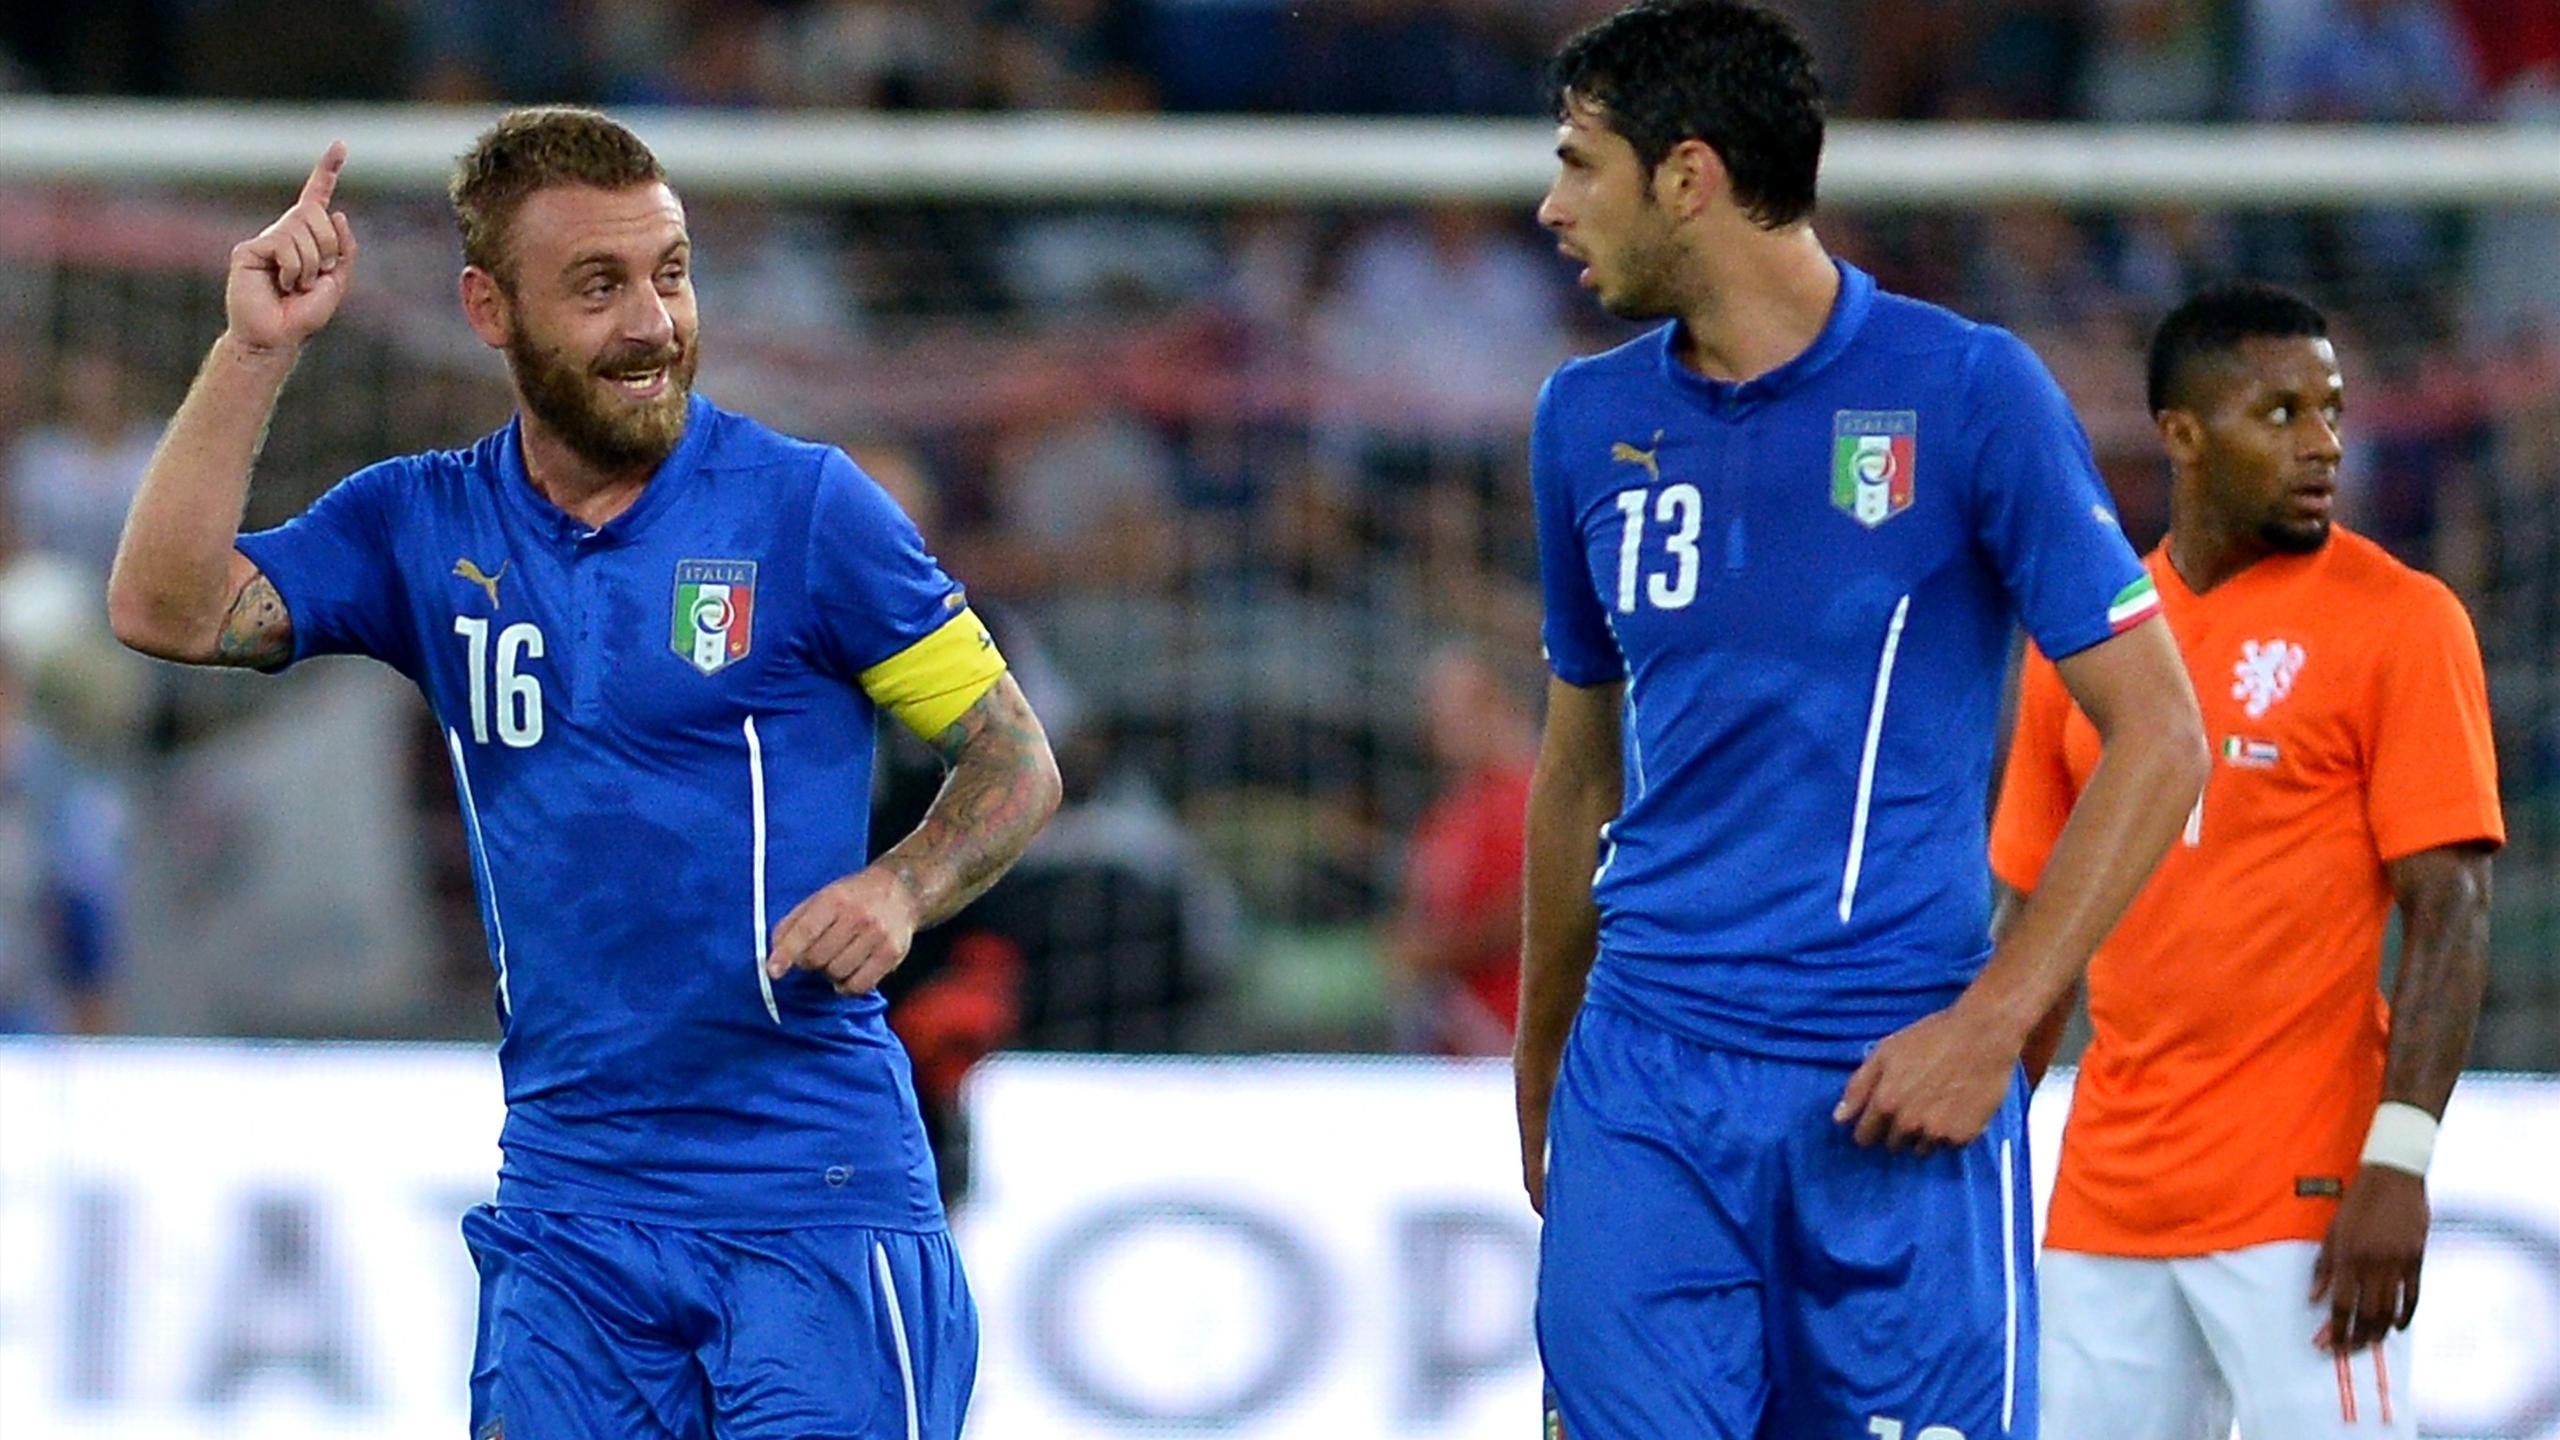 International friendlies - Conte gets Italy tenure off to winning start against Holland